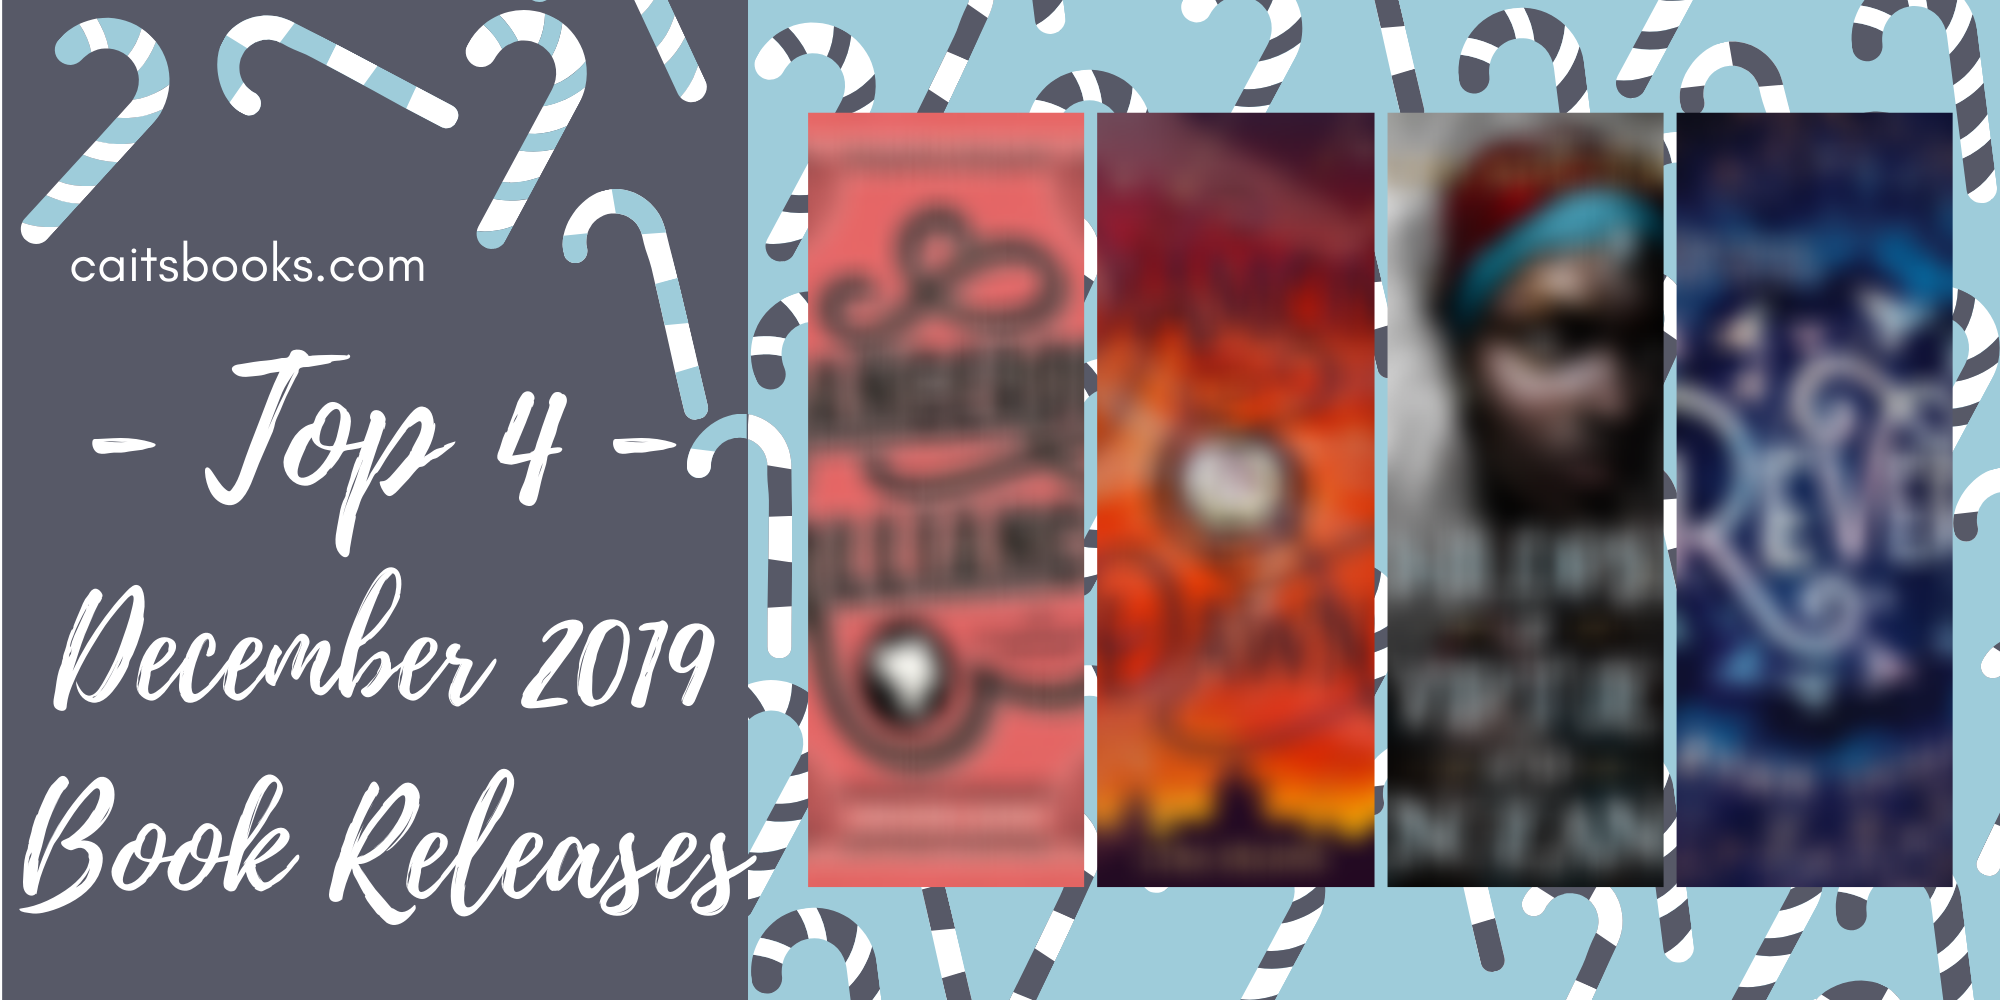 caitsbooks.com Top 4 December 2019 Book Releases